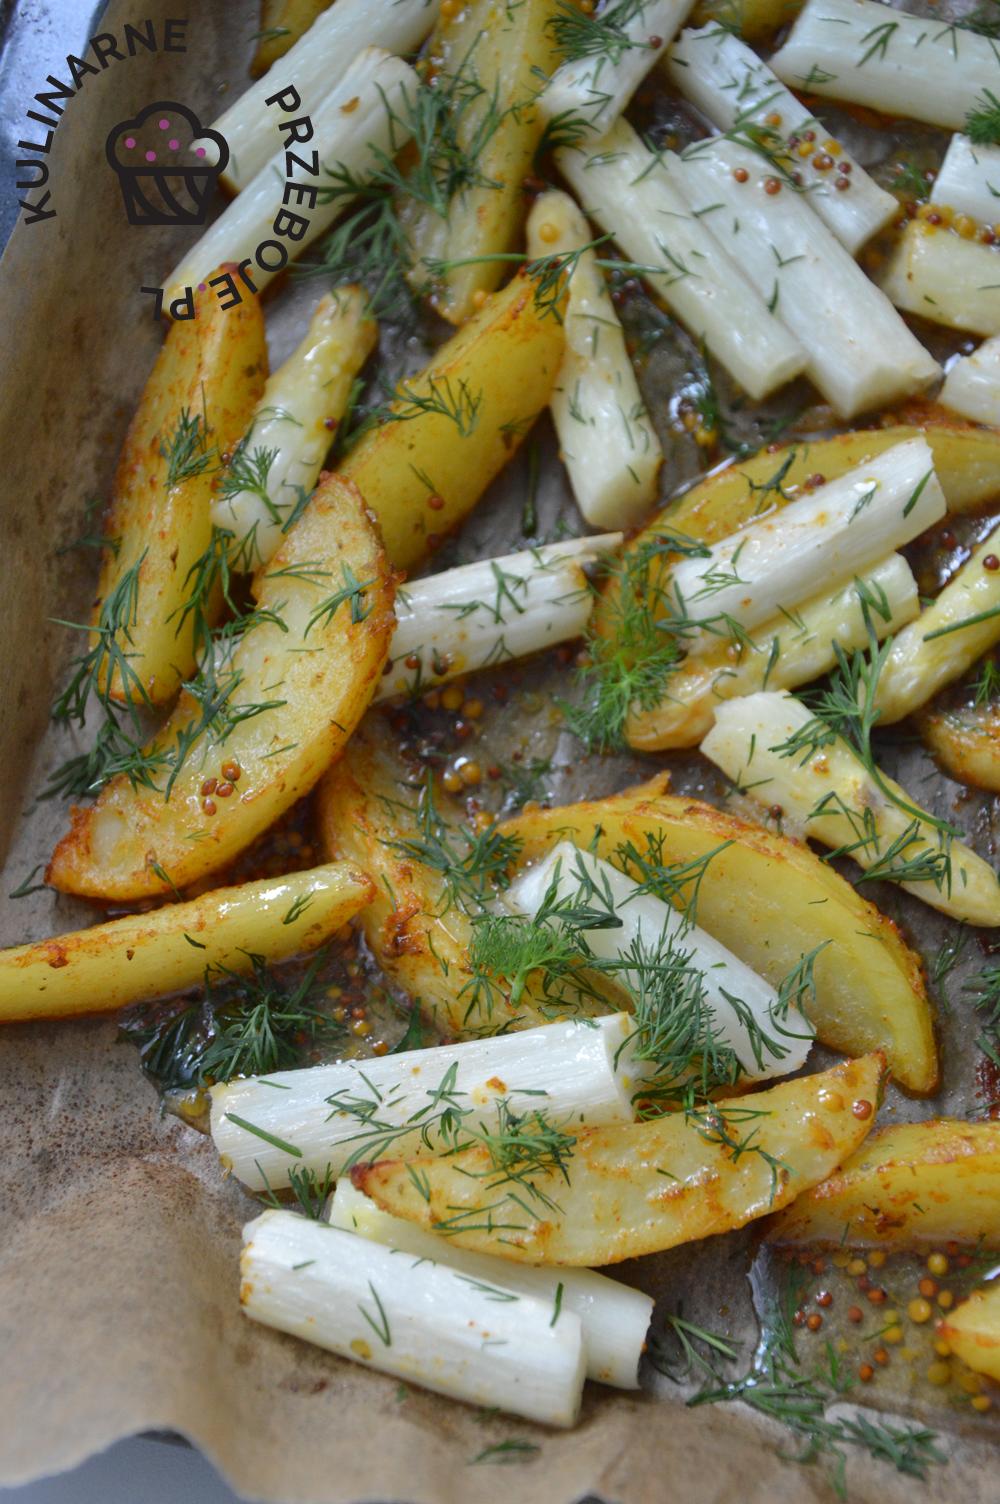 szparagi w sosie miodowym vinegrette